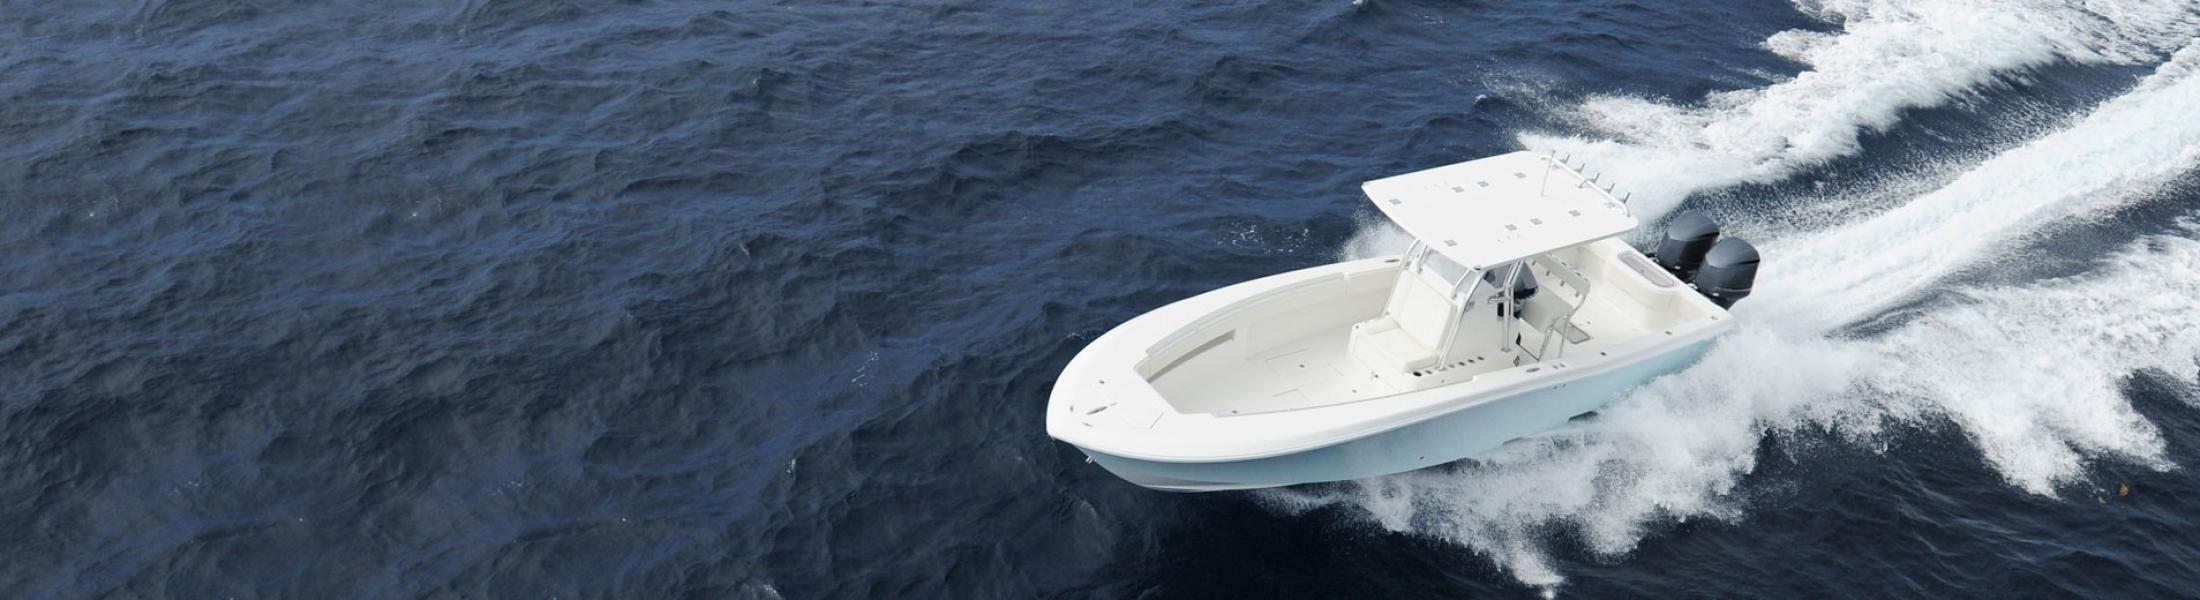 Boat Insurance Naples